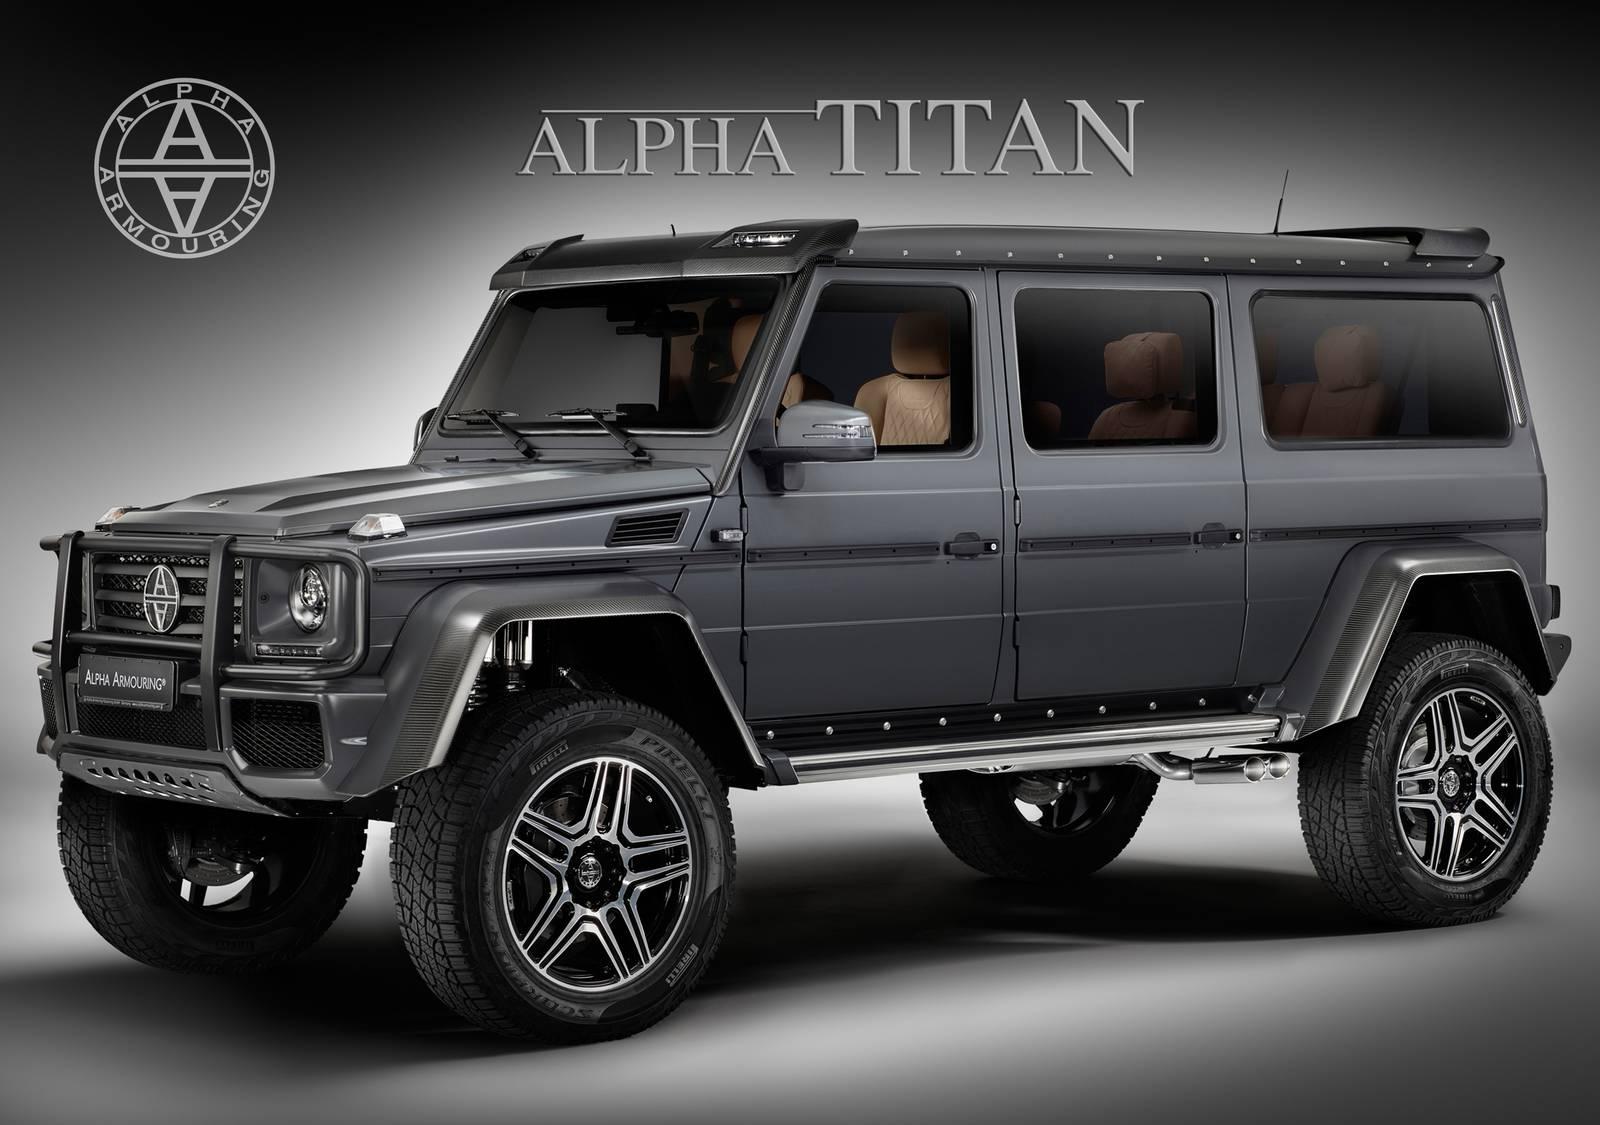 Alpha titan